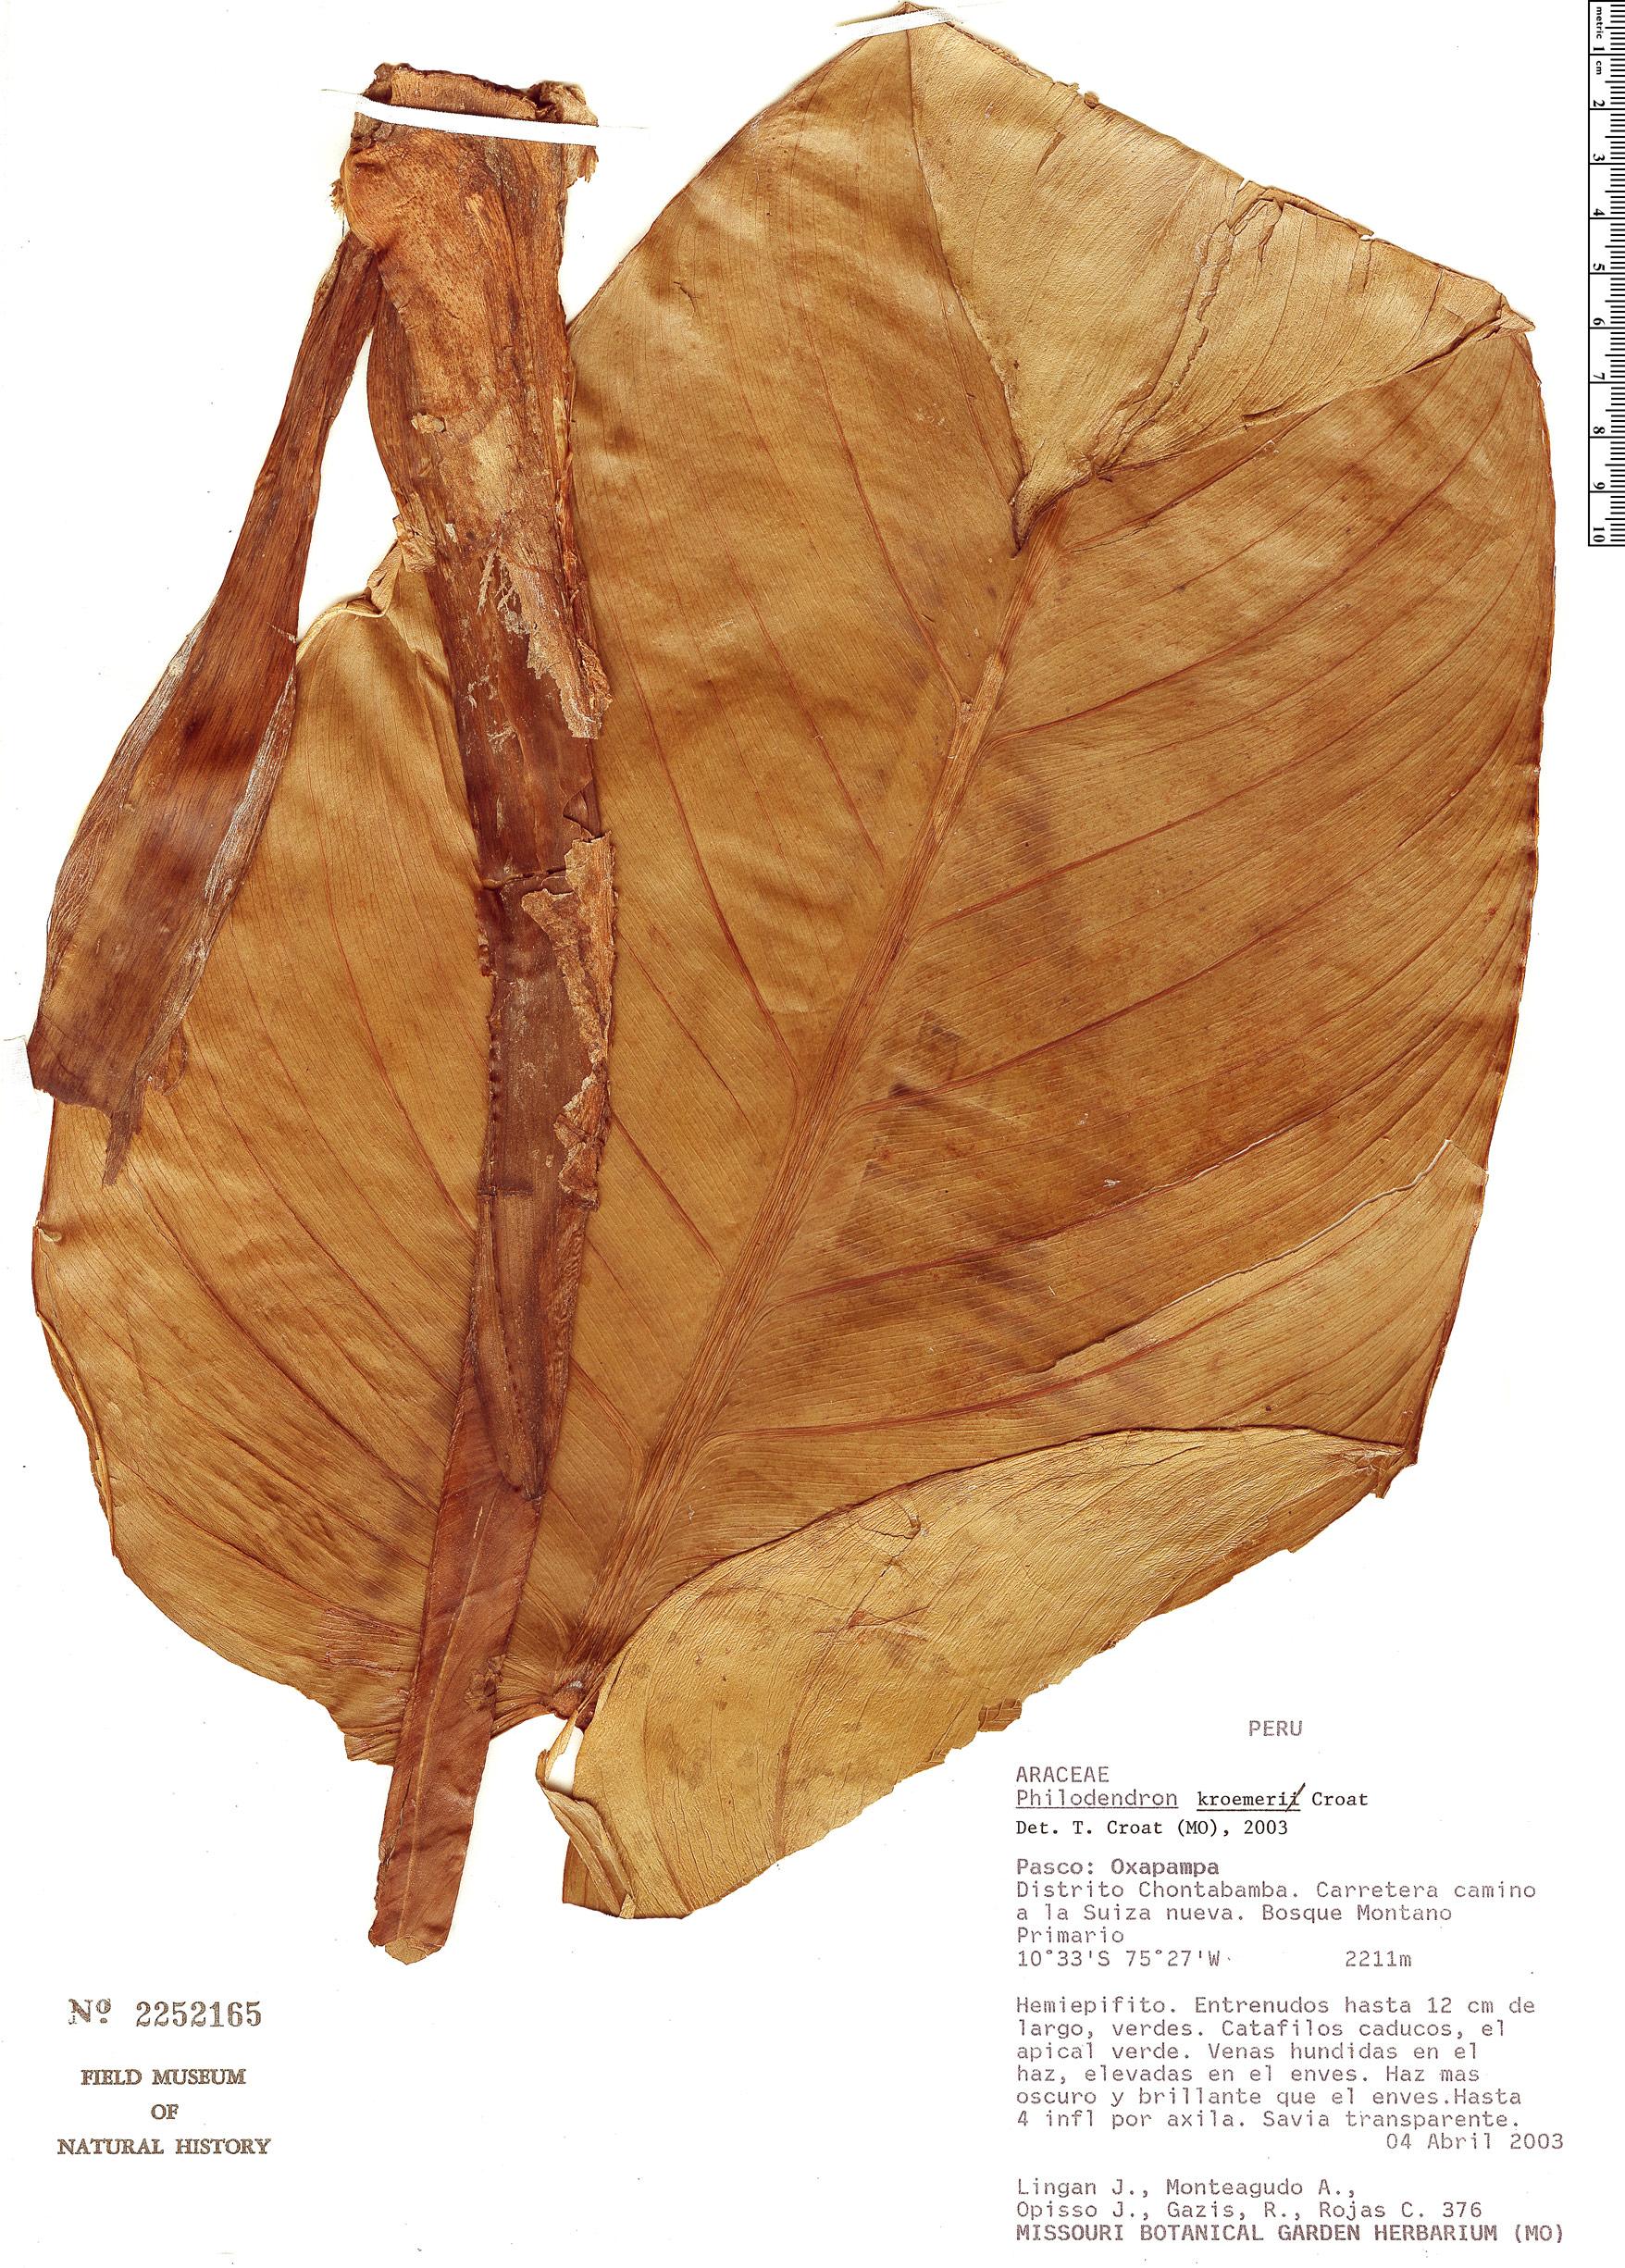 Specimen: Philodendron kroemeri